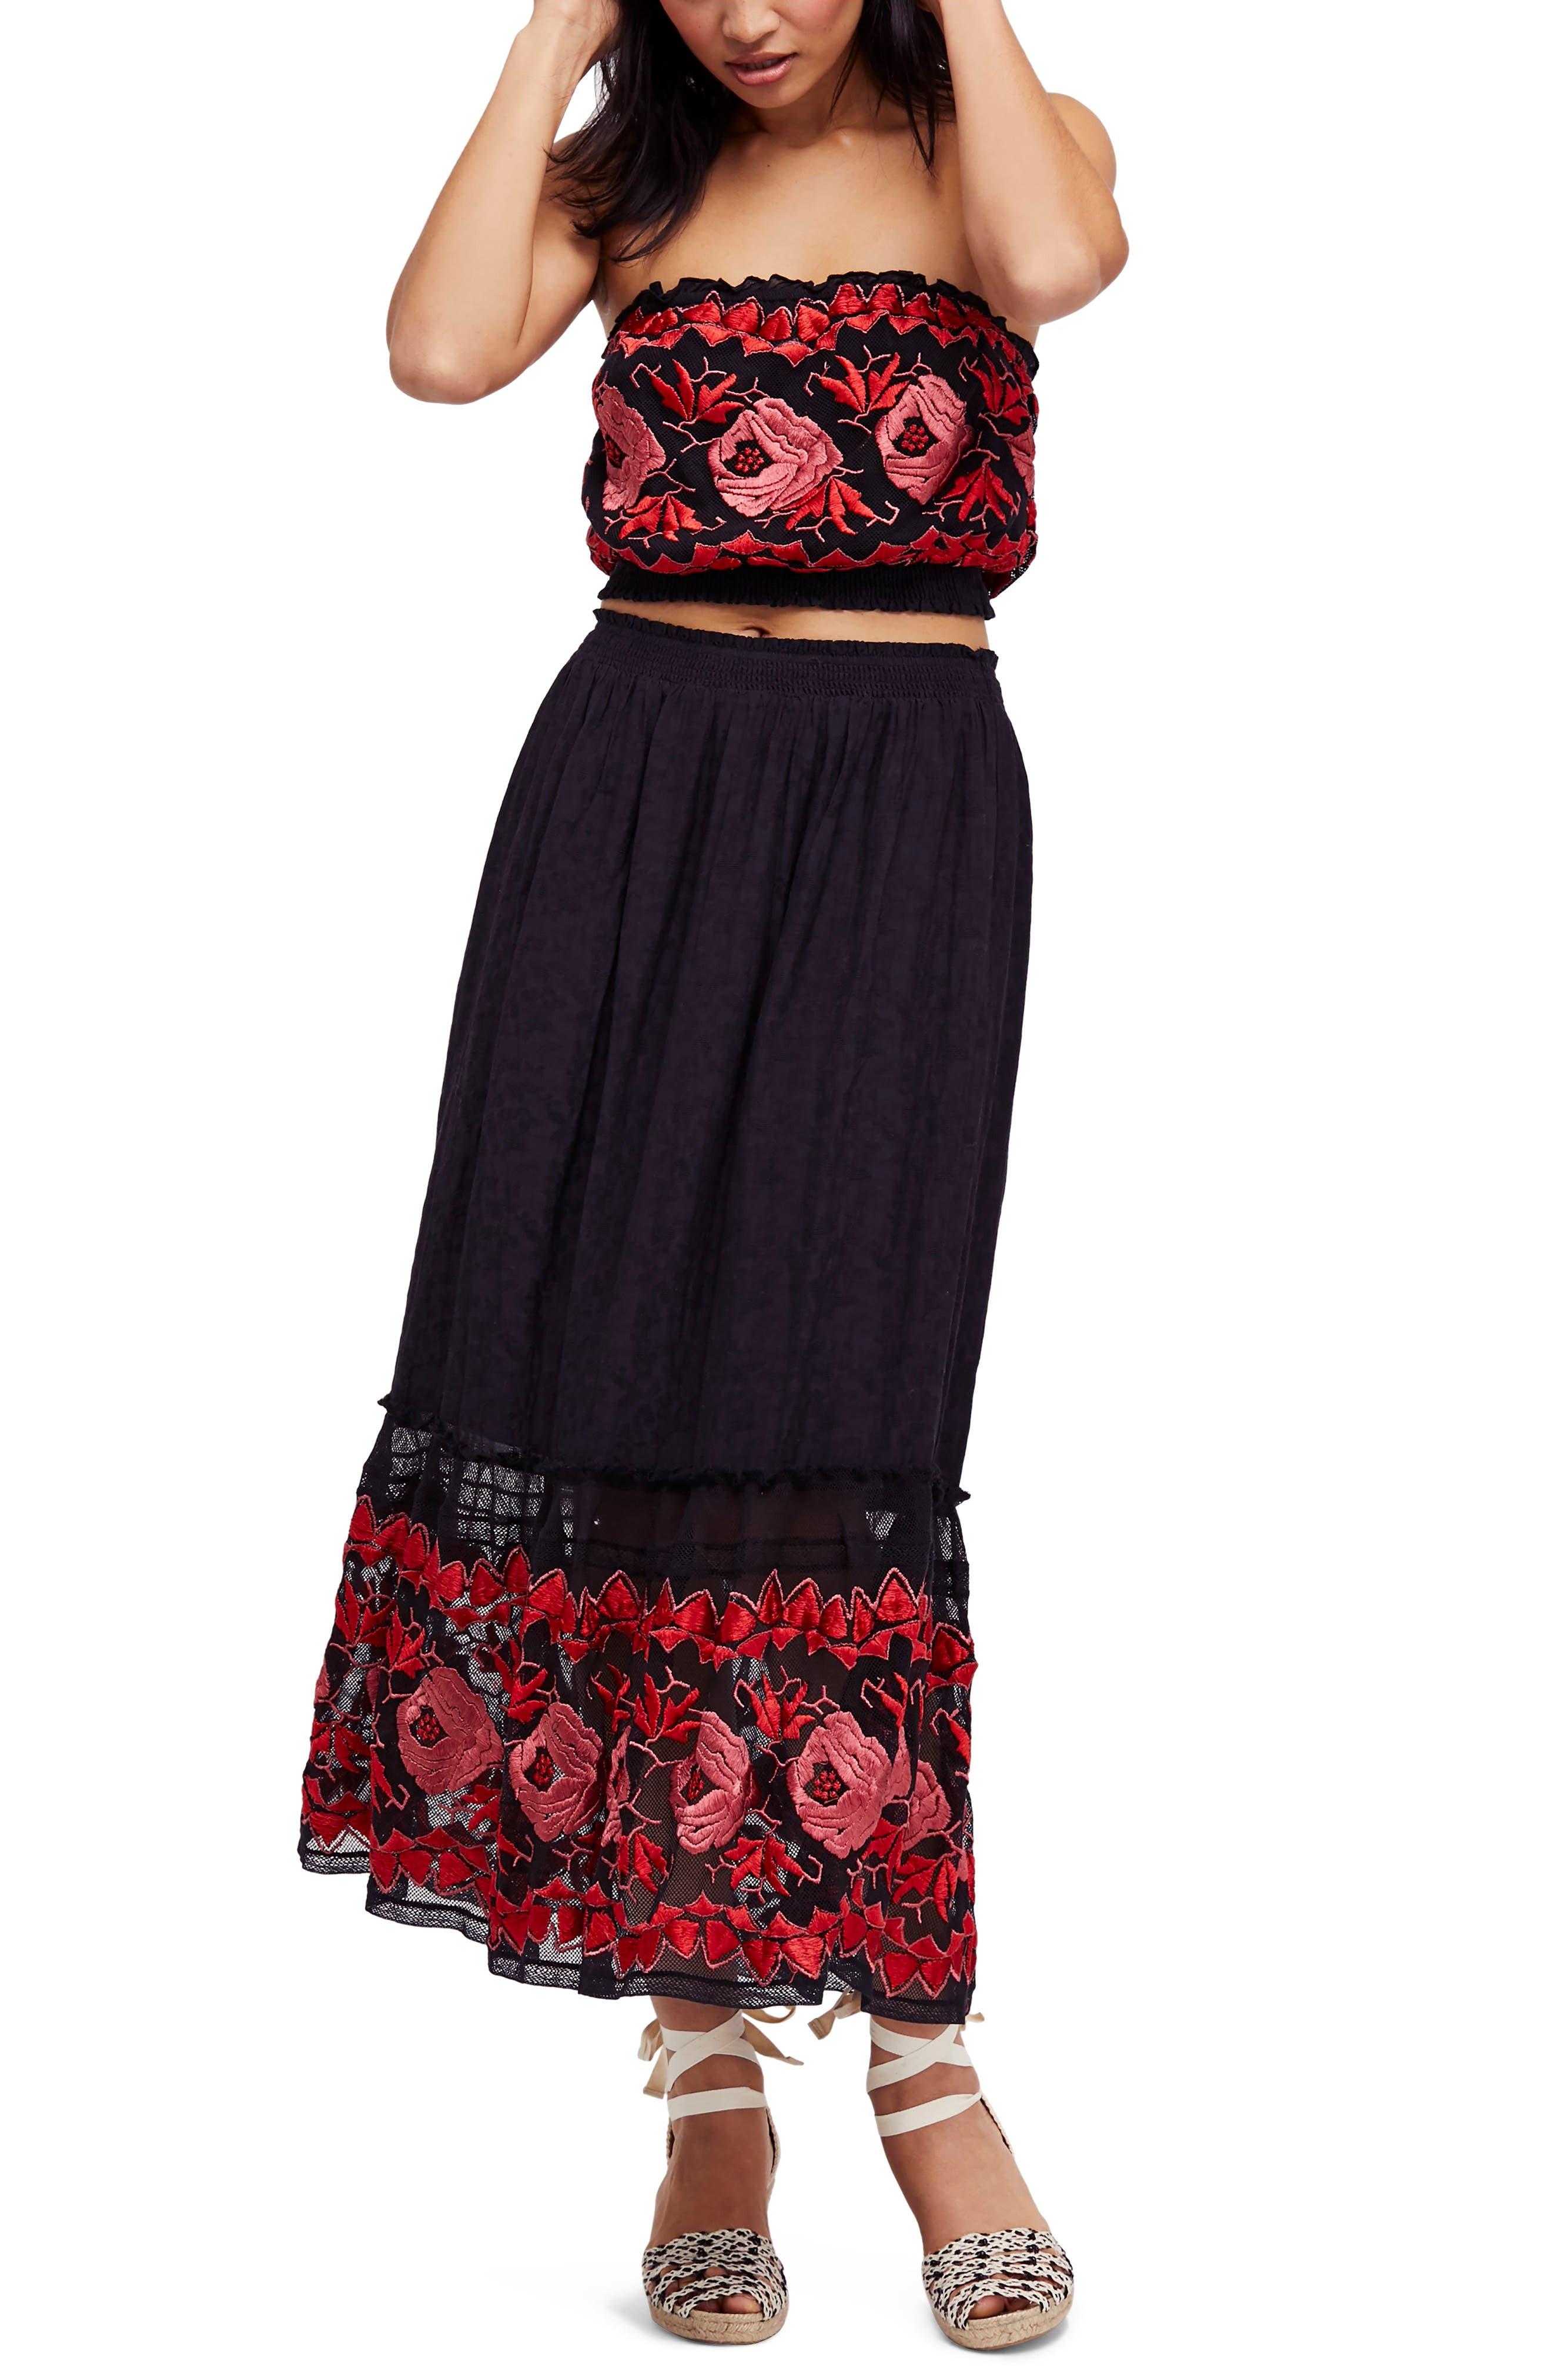 Rosebud Top & Skirt,                             Main thumbnail 1, color,                             Black Combo